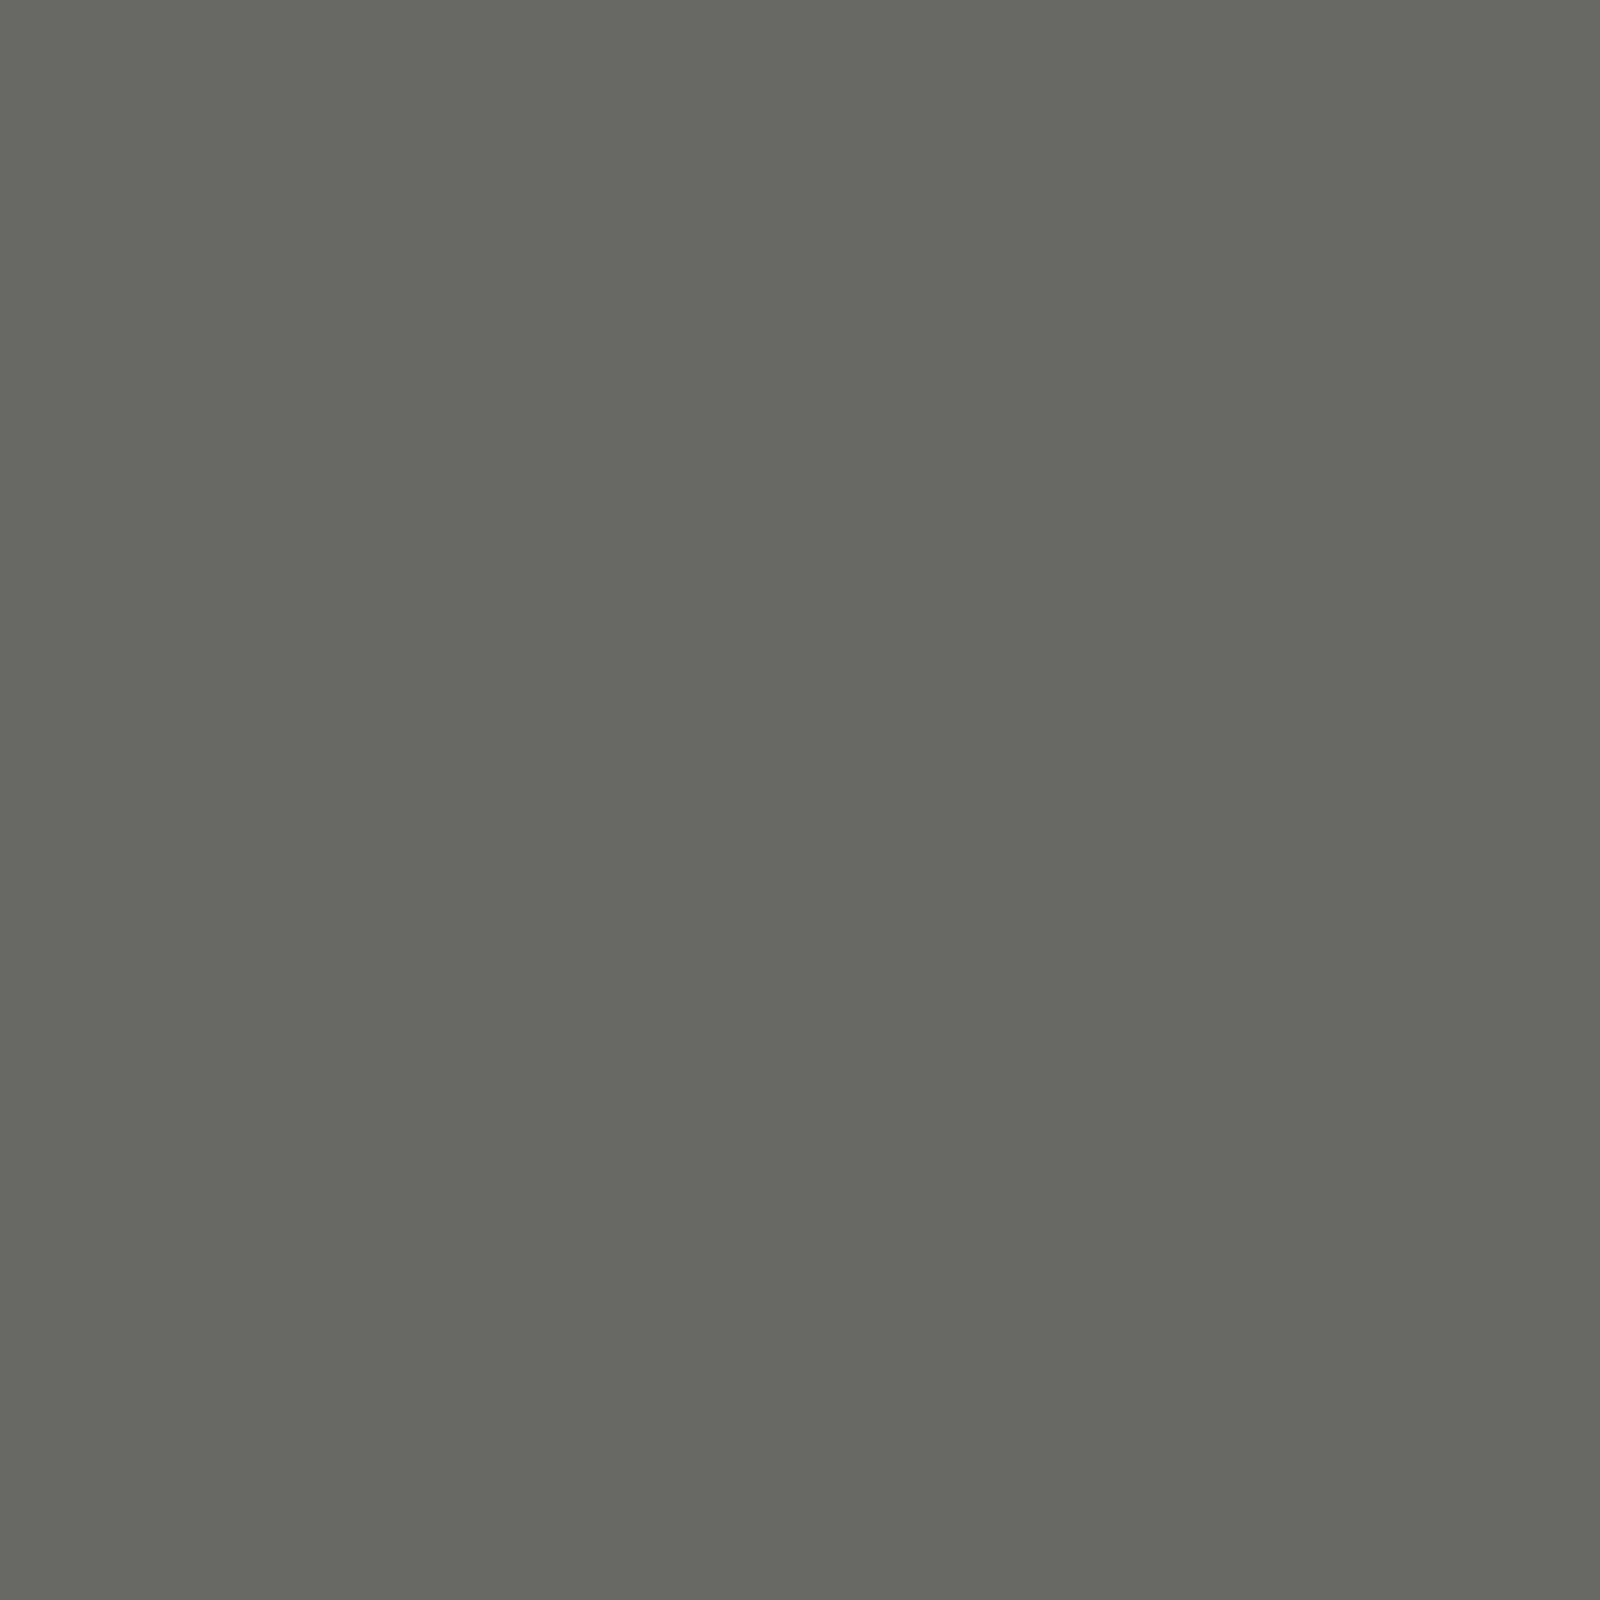 Have Glass Grey FS36170